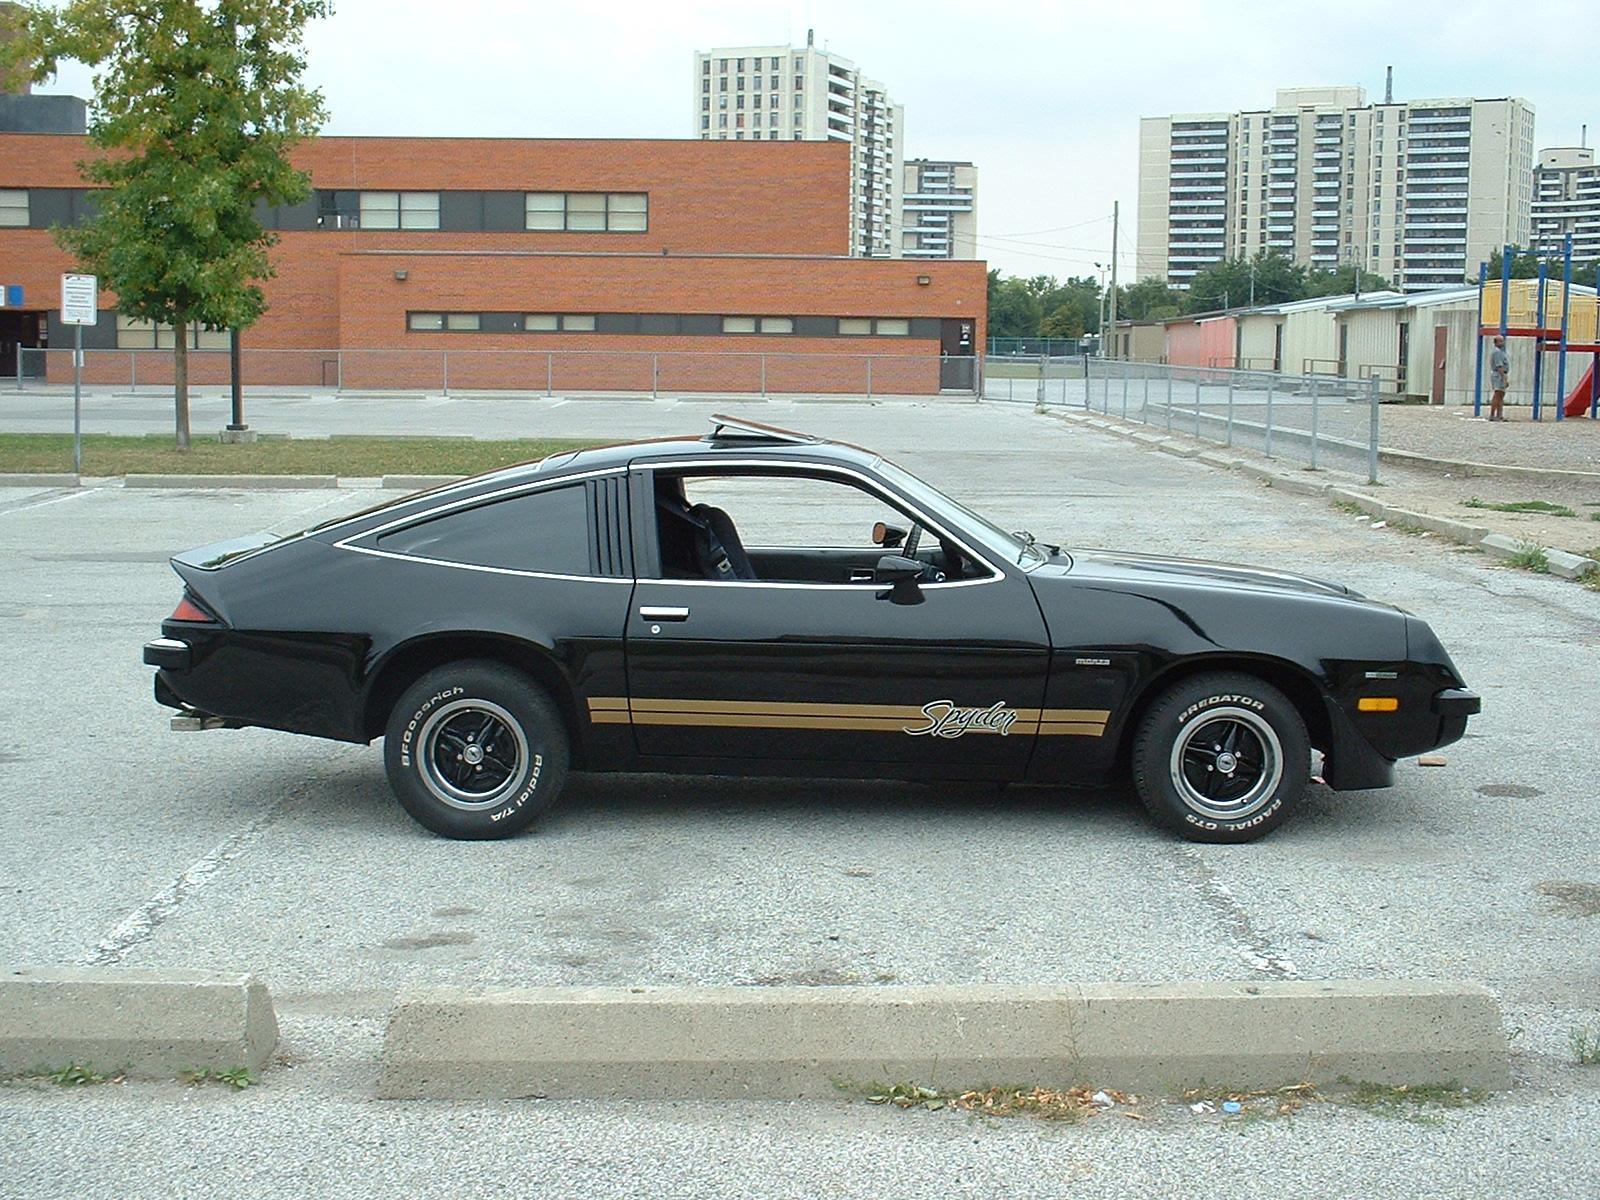 Chevy Monza profile